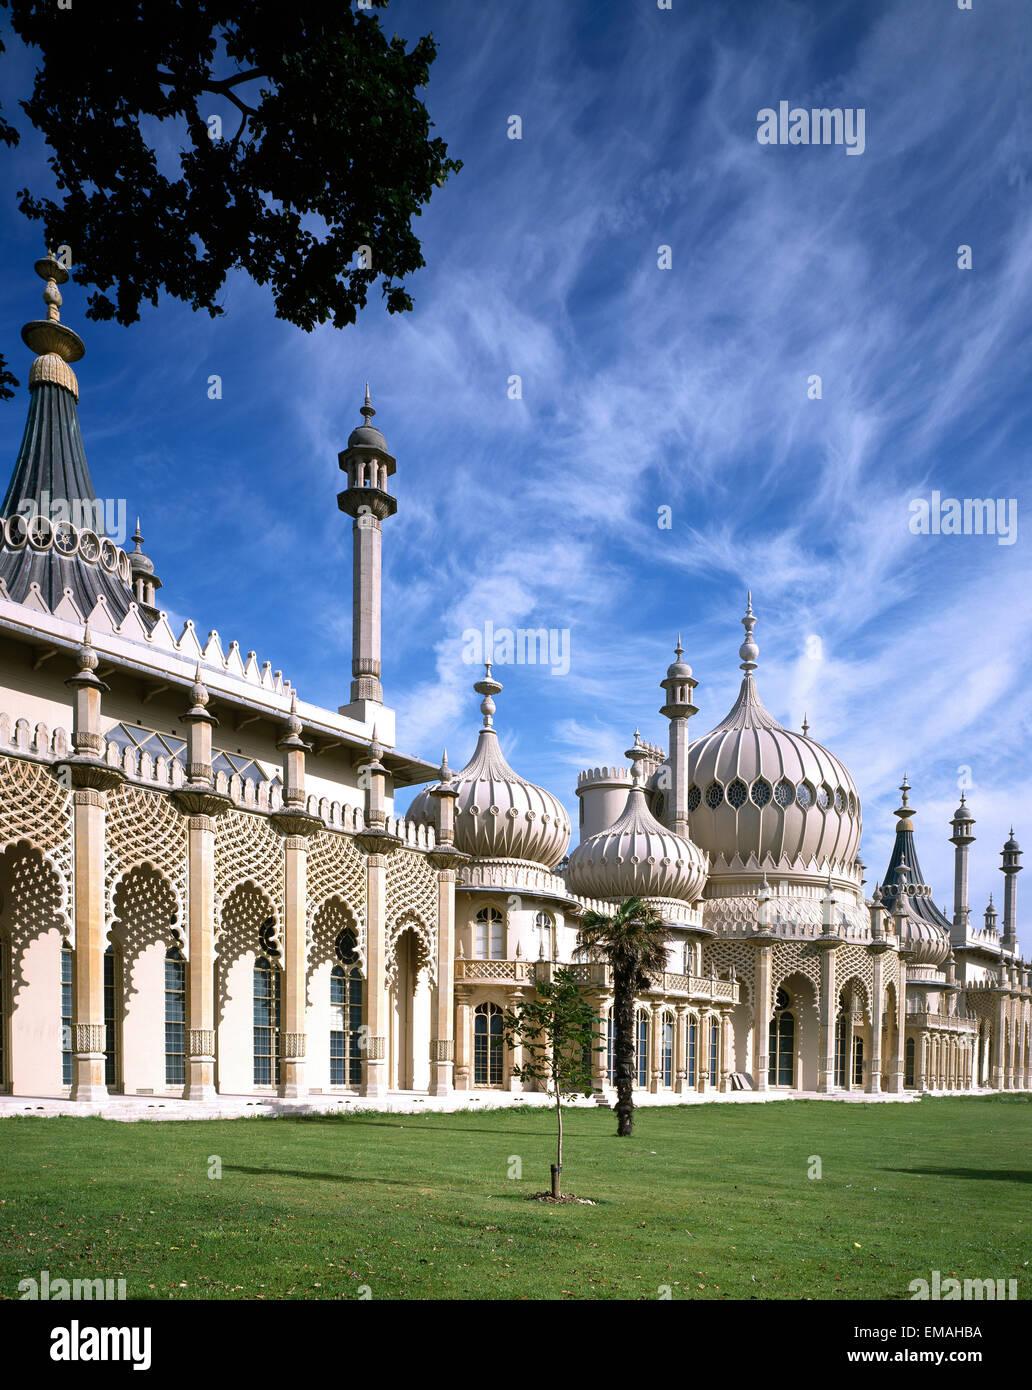 Royal Pavilion, Brighton, East Sussex, England, UK - Stock Image